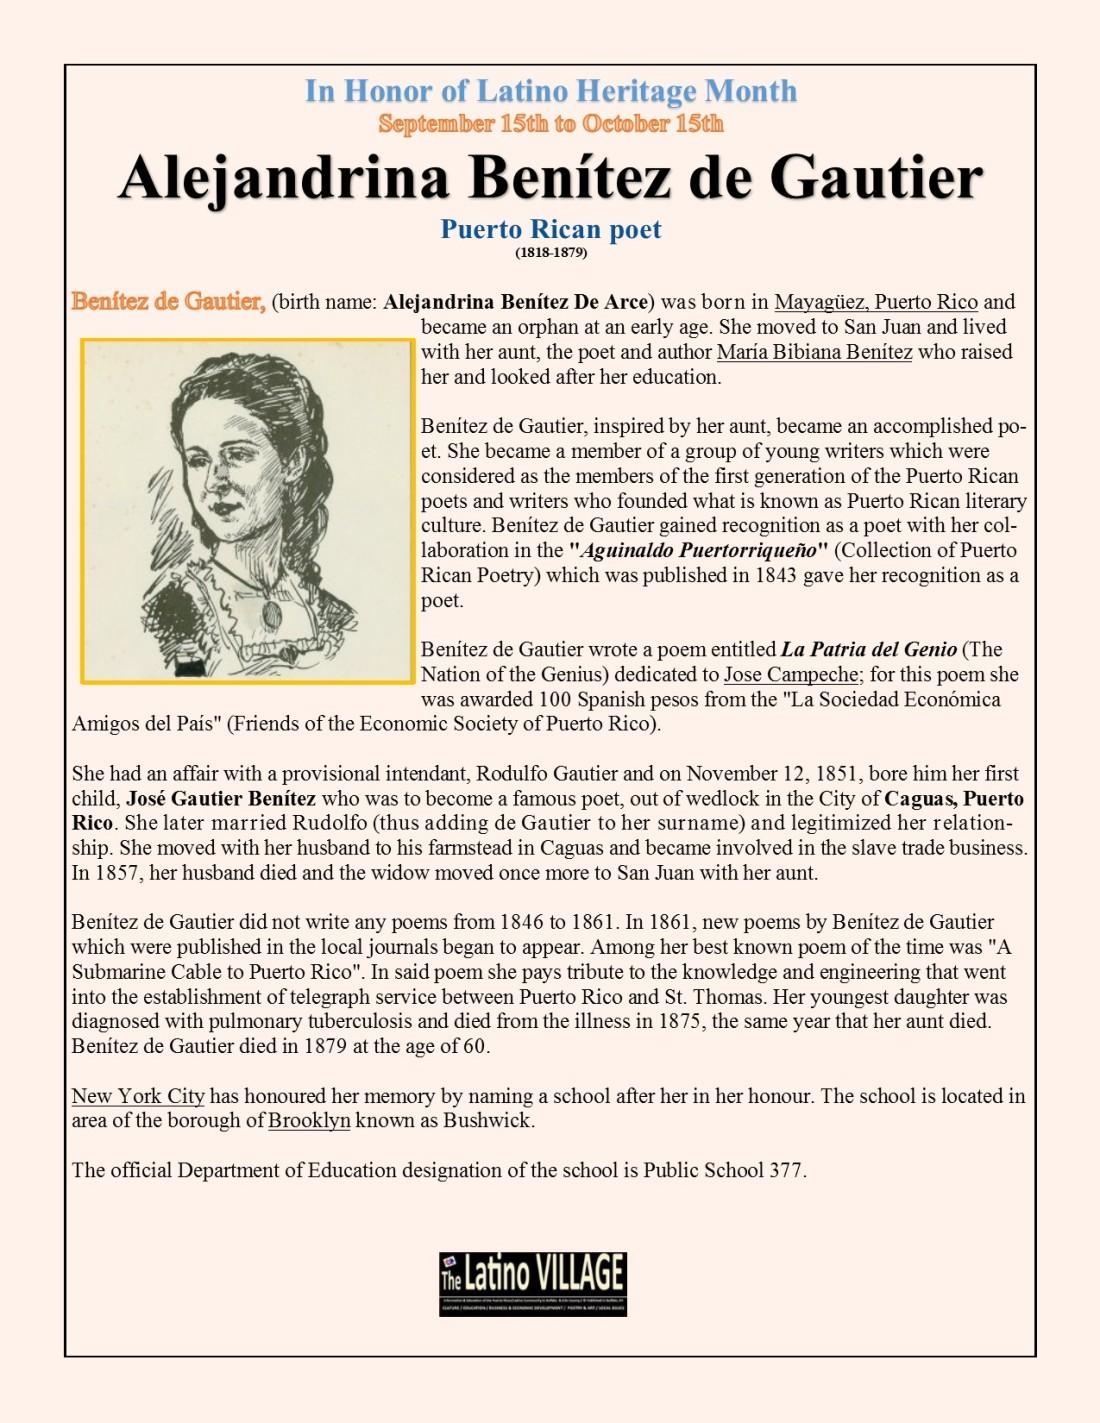 Alejandrina Benítez de Gautier